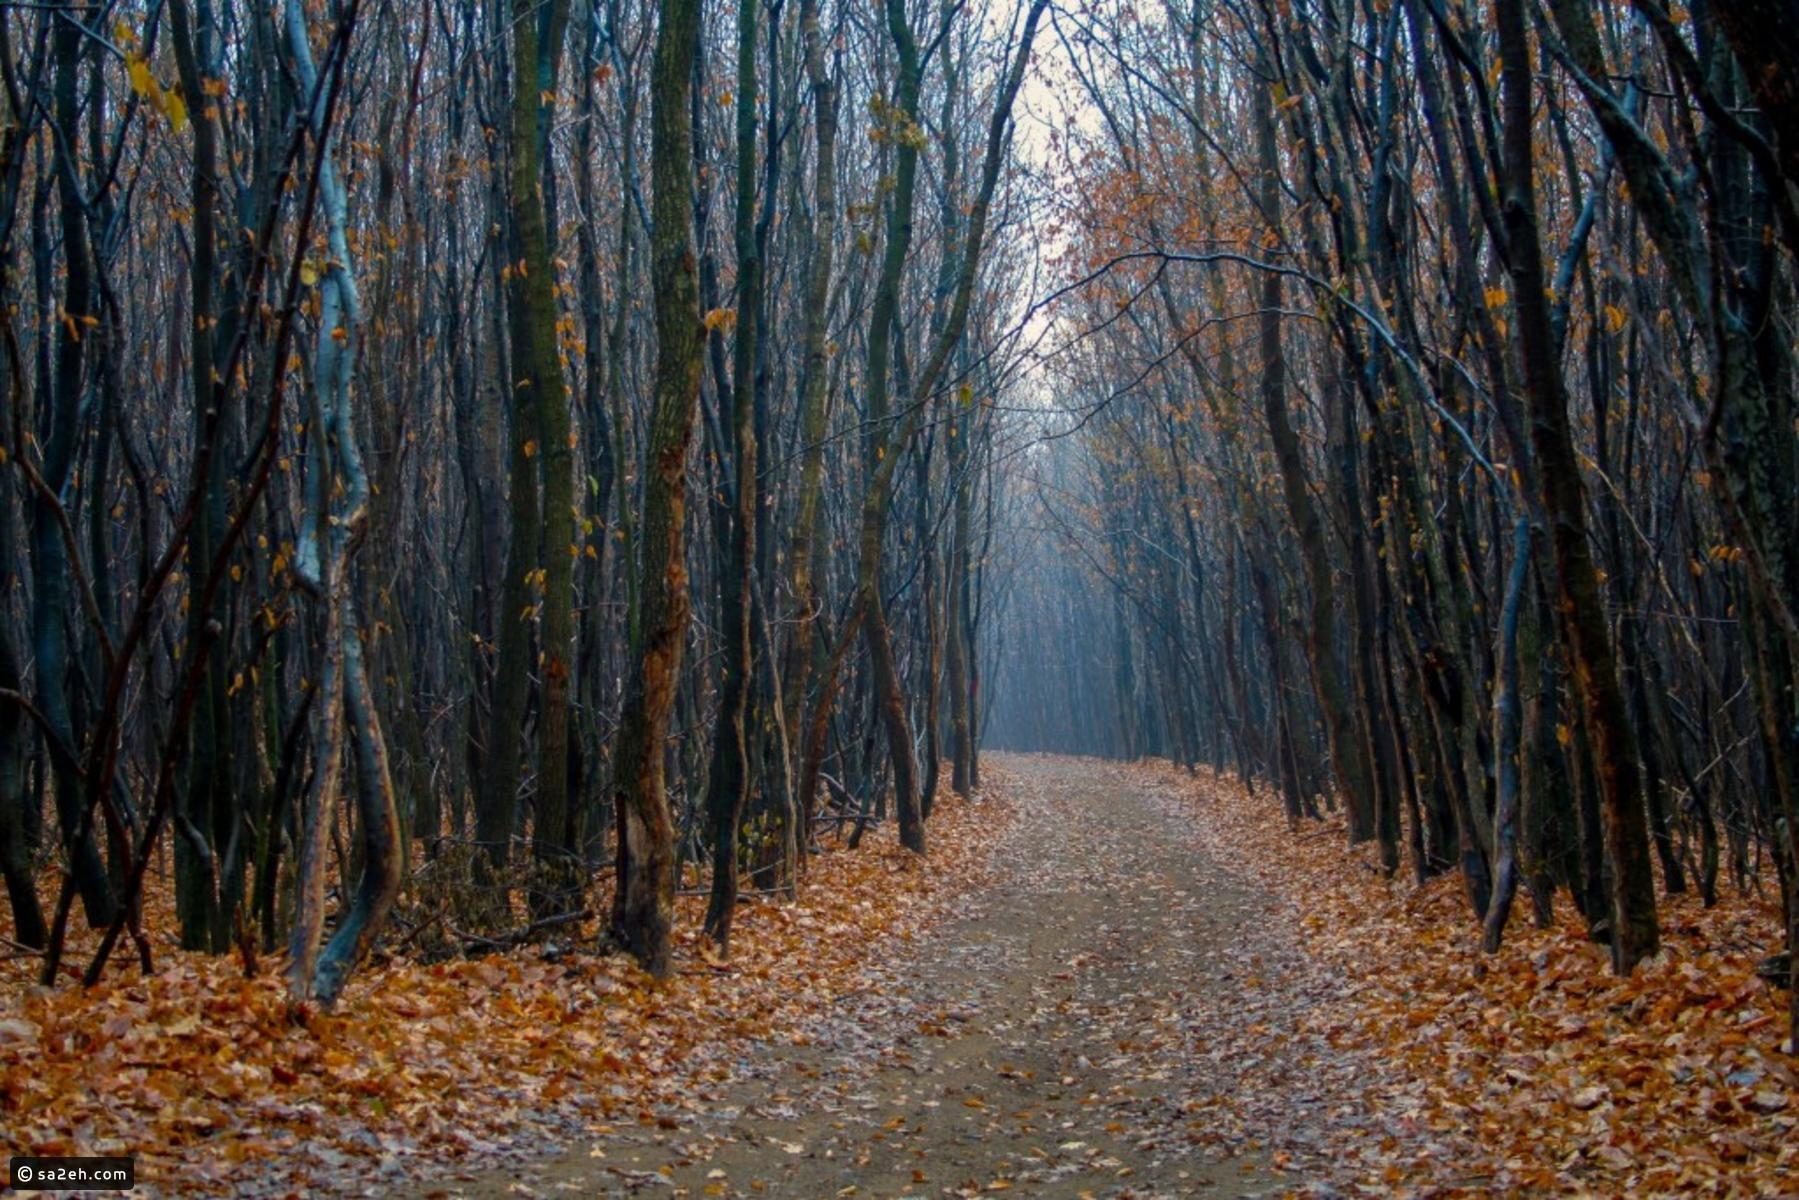 صور أغرب وأجمل الغابات حول العالم سائح Scary Places Hoia Baciu Forest Mysterious Places